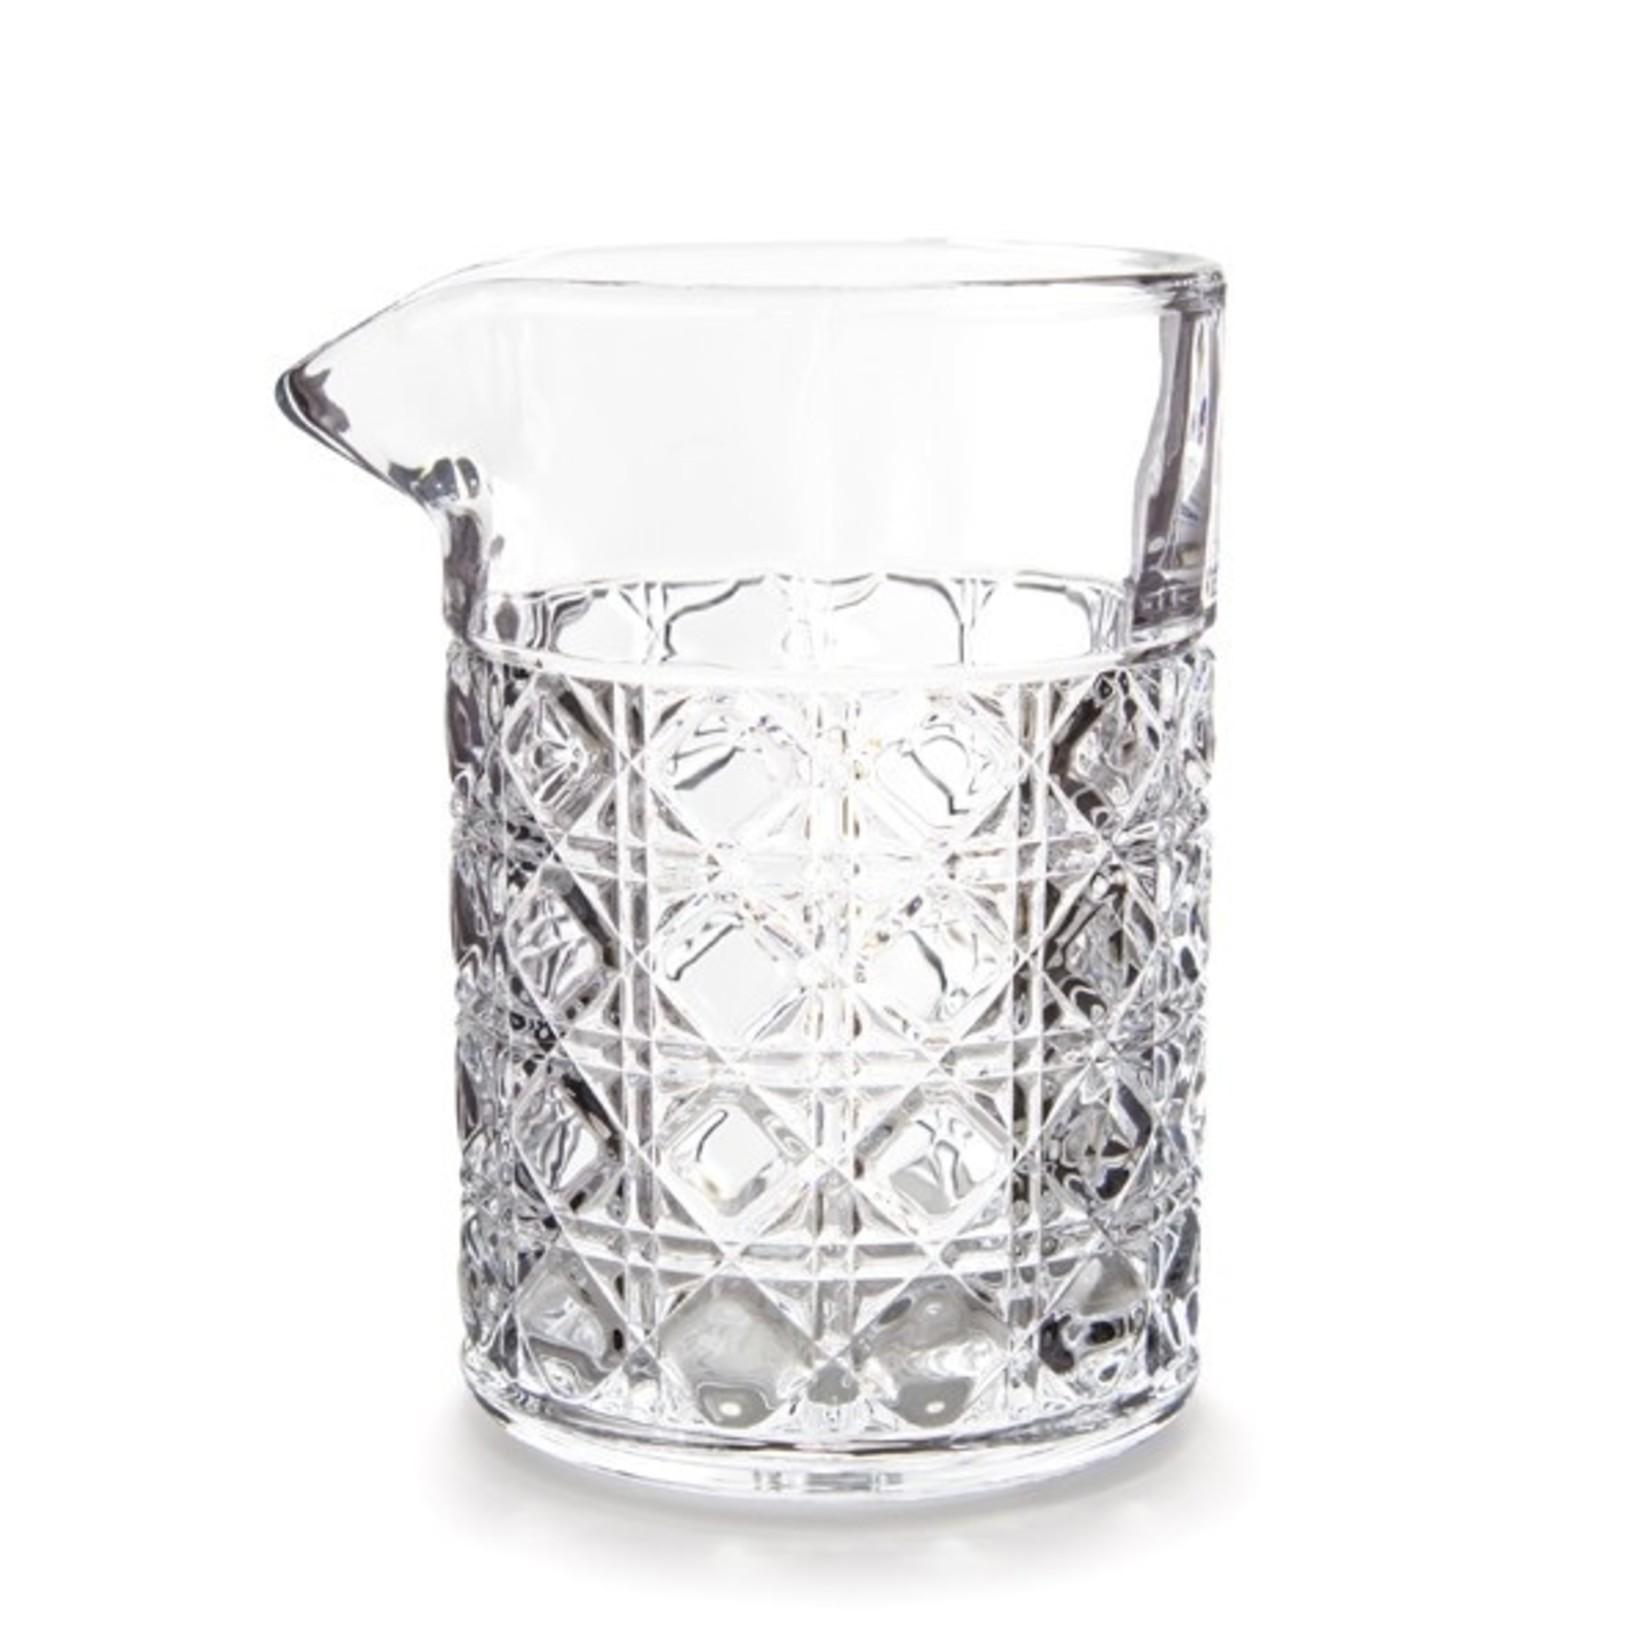 Cocktail Kingdom Sokata Mixing Glass